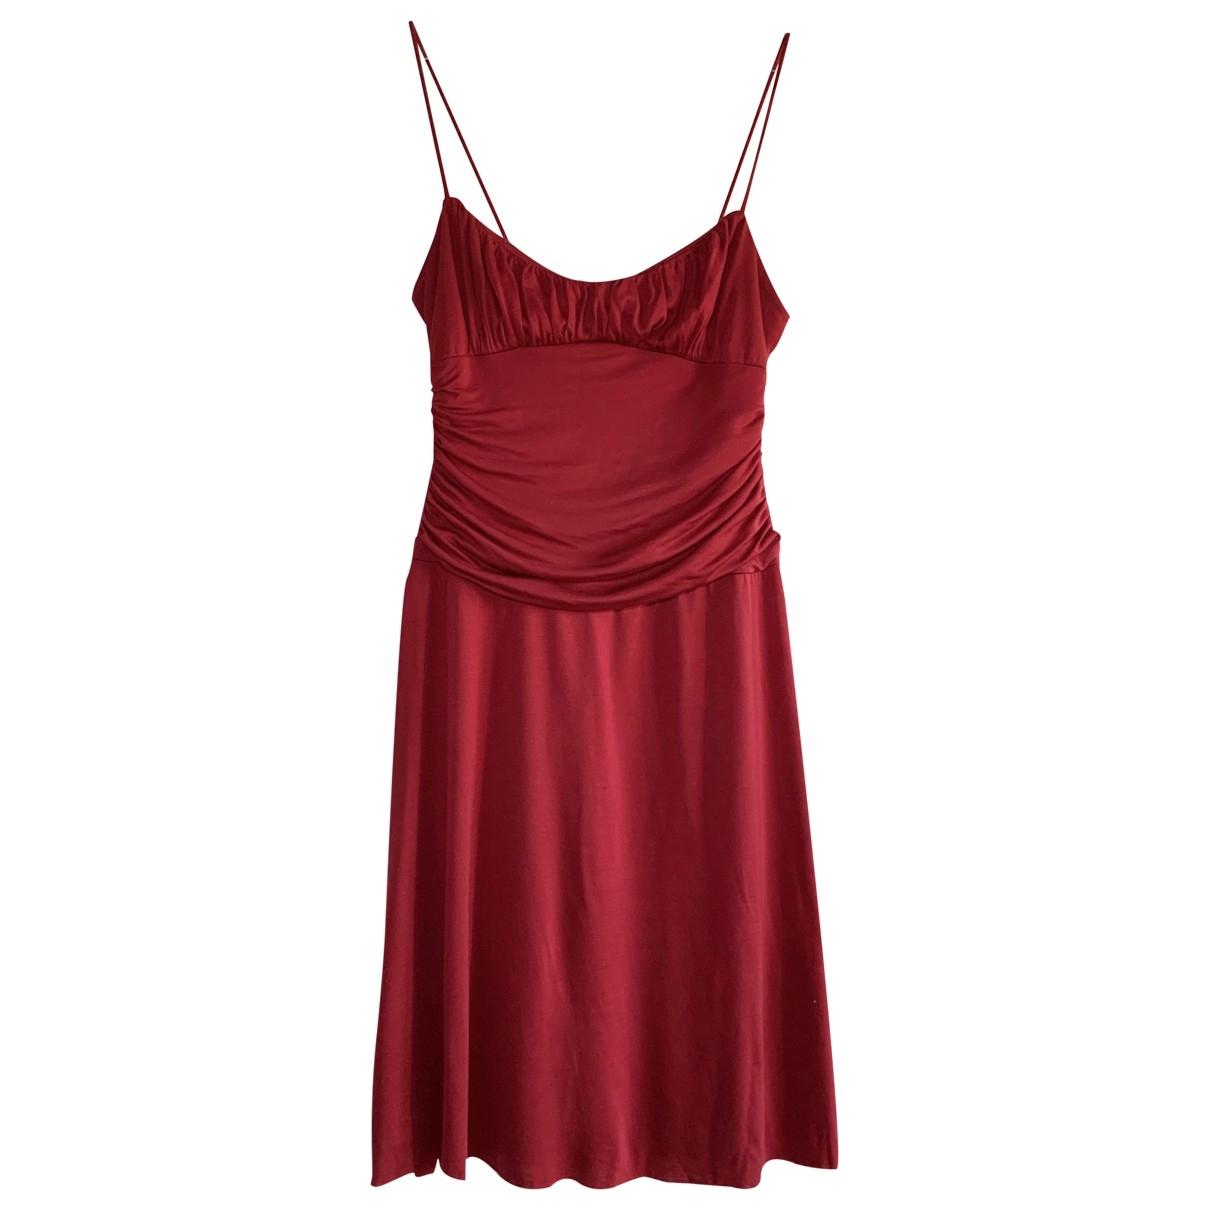 Velvet \N Kleid in  Bordeauxrot Synthetik